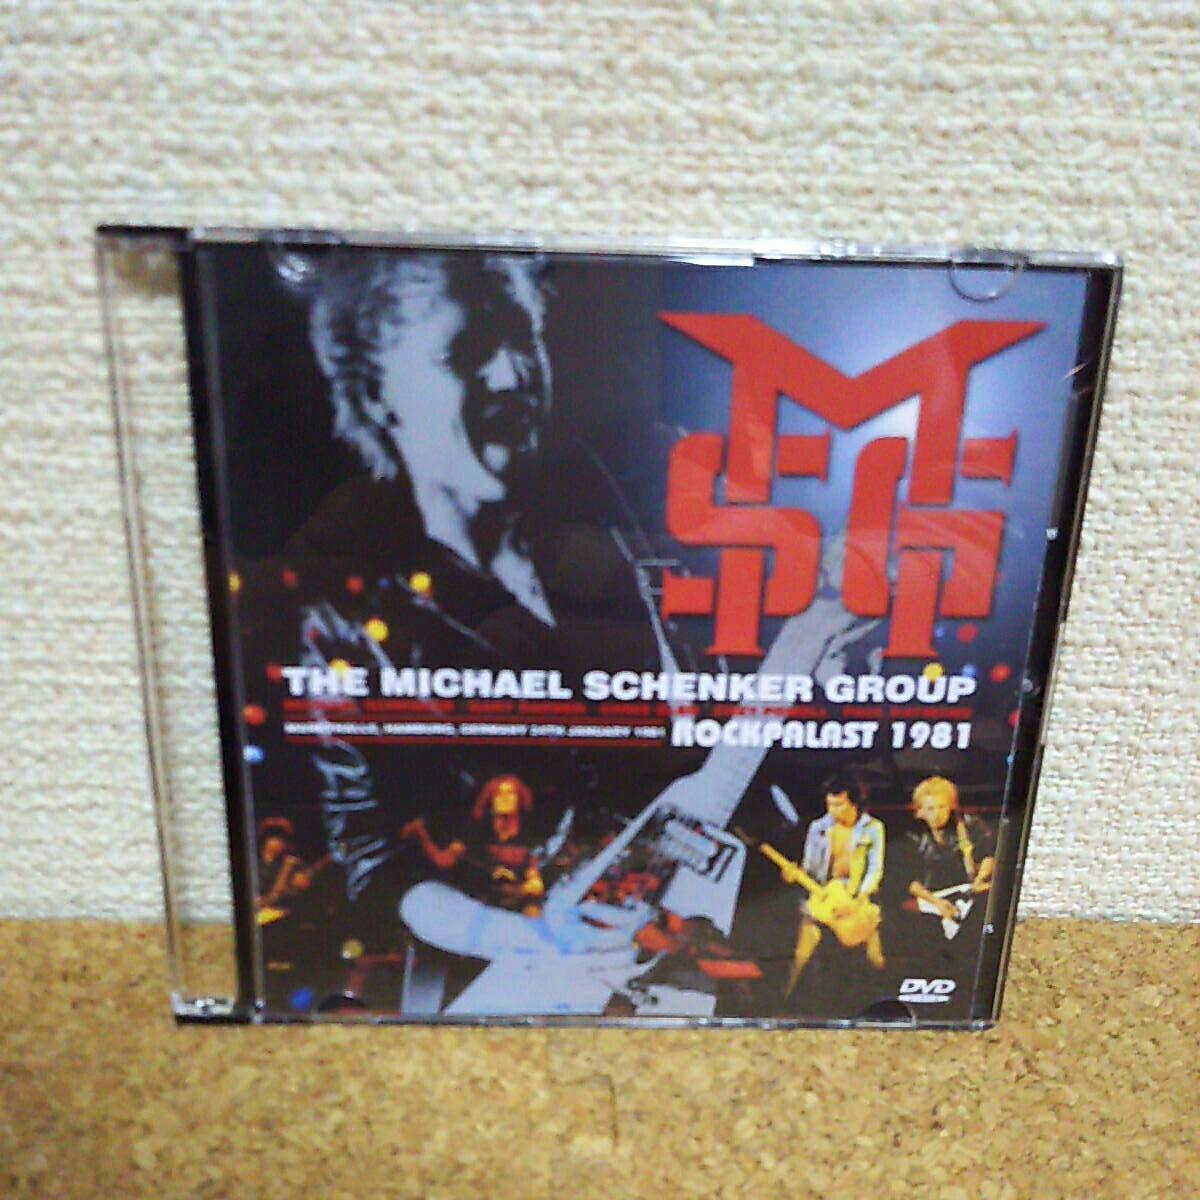 MICHAEL SCHENKER GROUP/Rockpalast 1981 Pro-Shot 65min マイケル・シェンカー・グループ